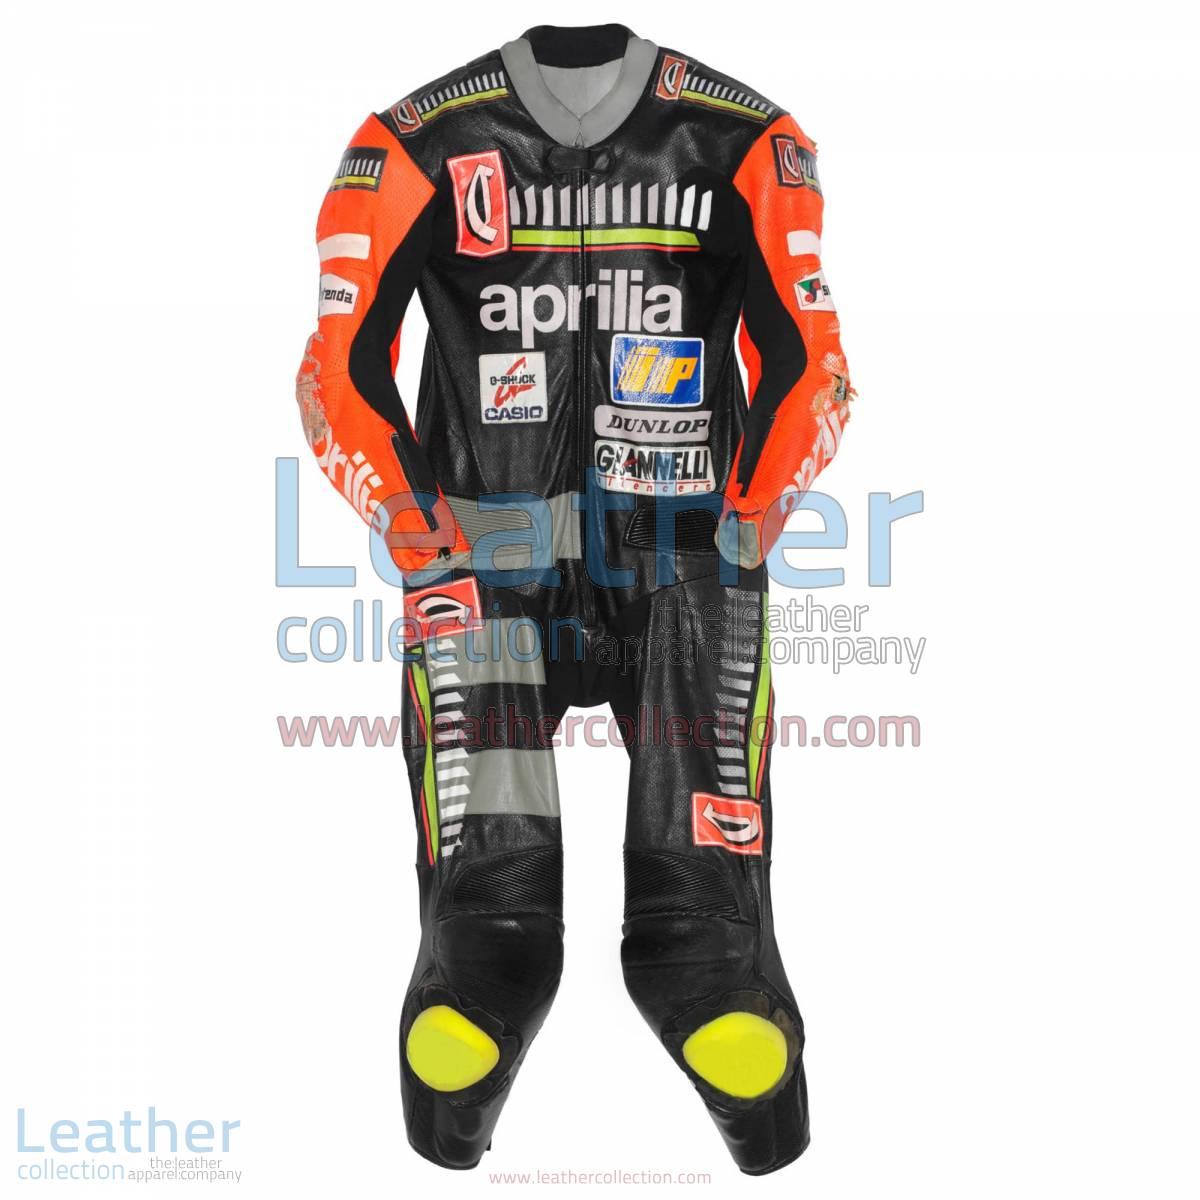 Max Biaggi Aprilia GP 1995 Racing Leathers | aprilia